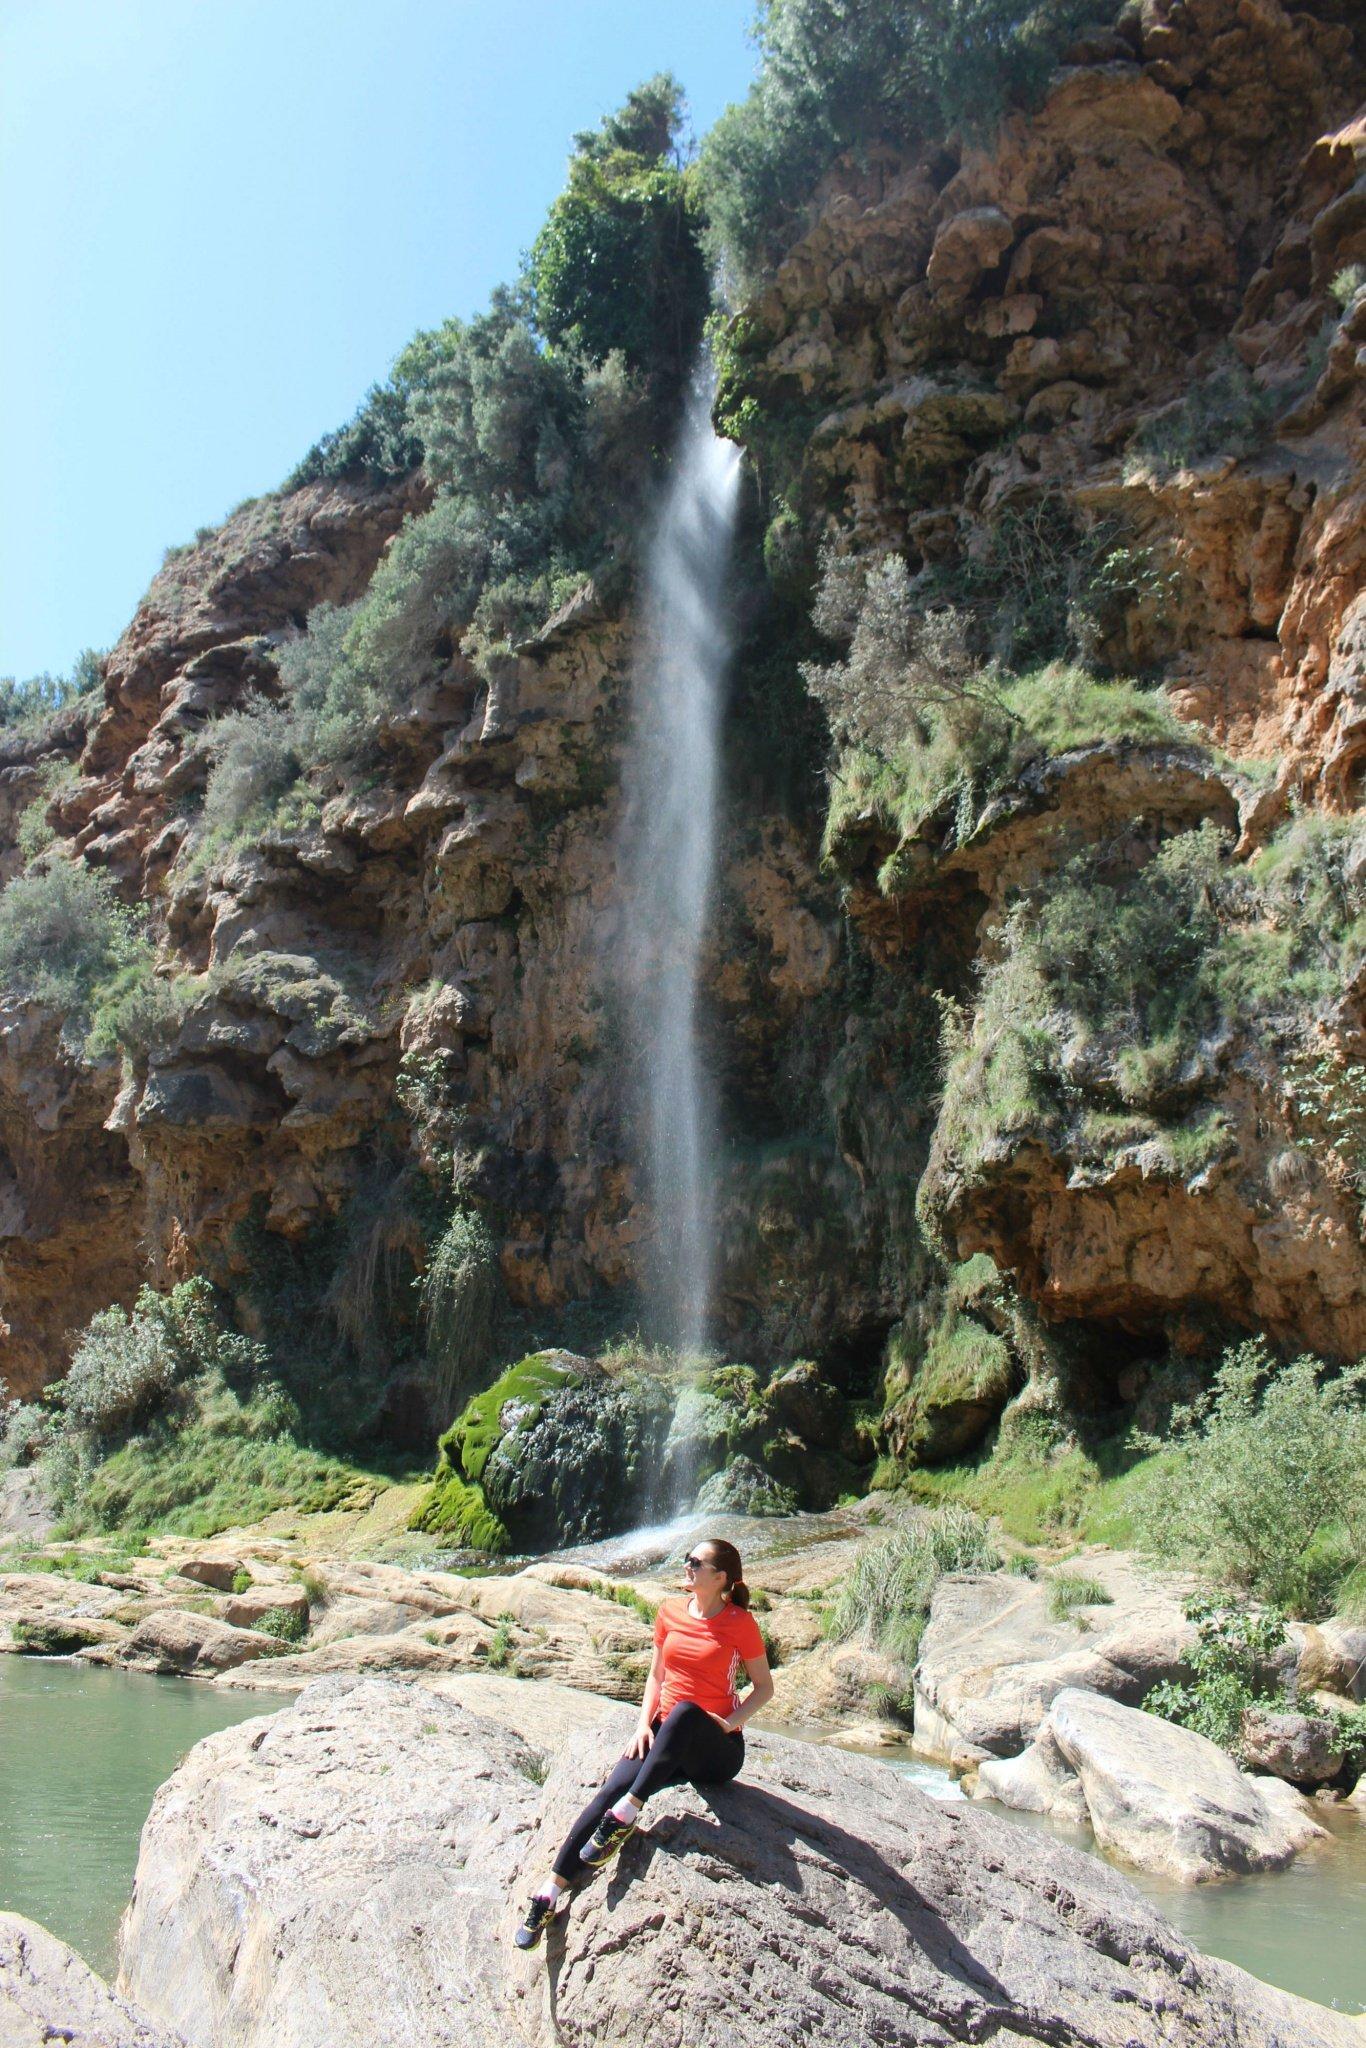 A waterfall in Navajas, near Valencia, Spain